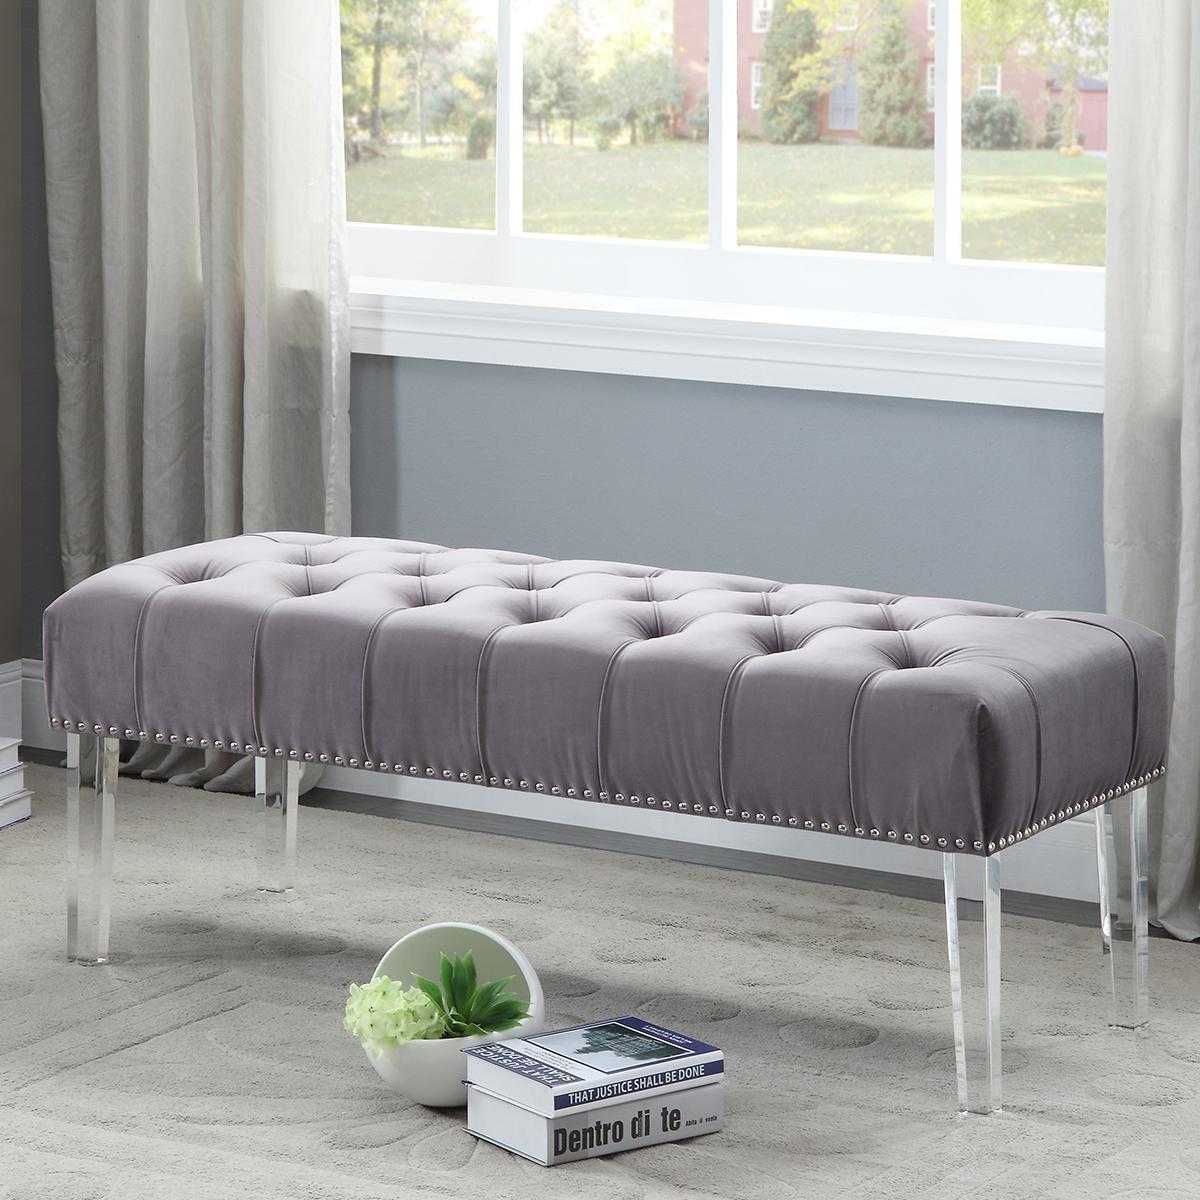 Celine Grey Tufted Velvet Bench W Nailhead Trim On Acrylic Legs By Meridian Furniture